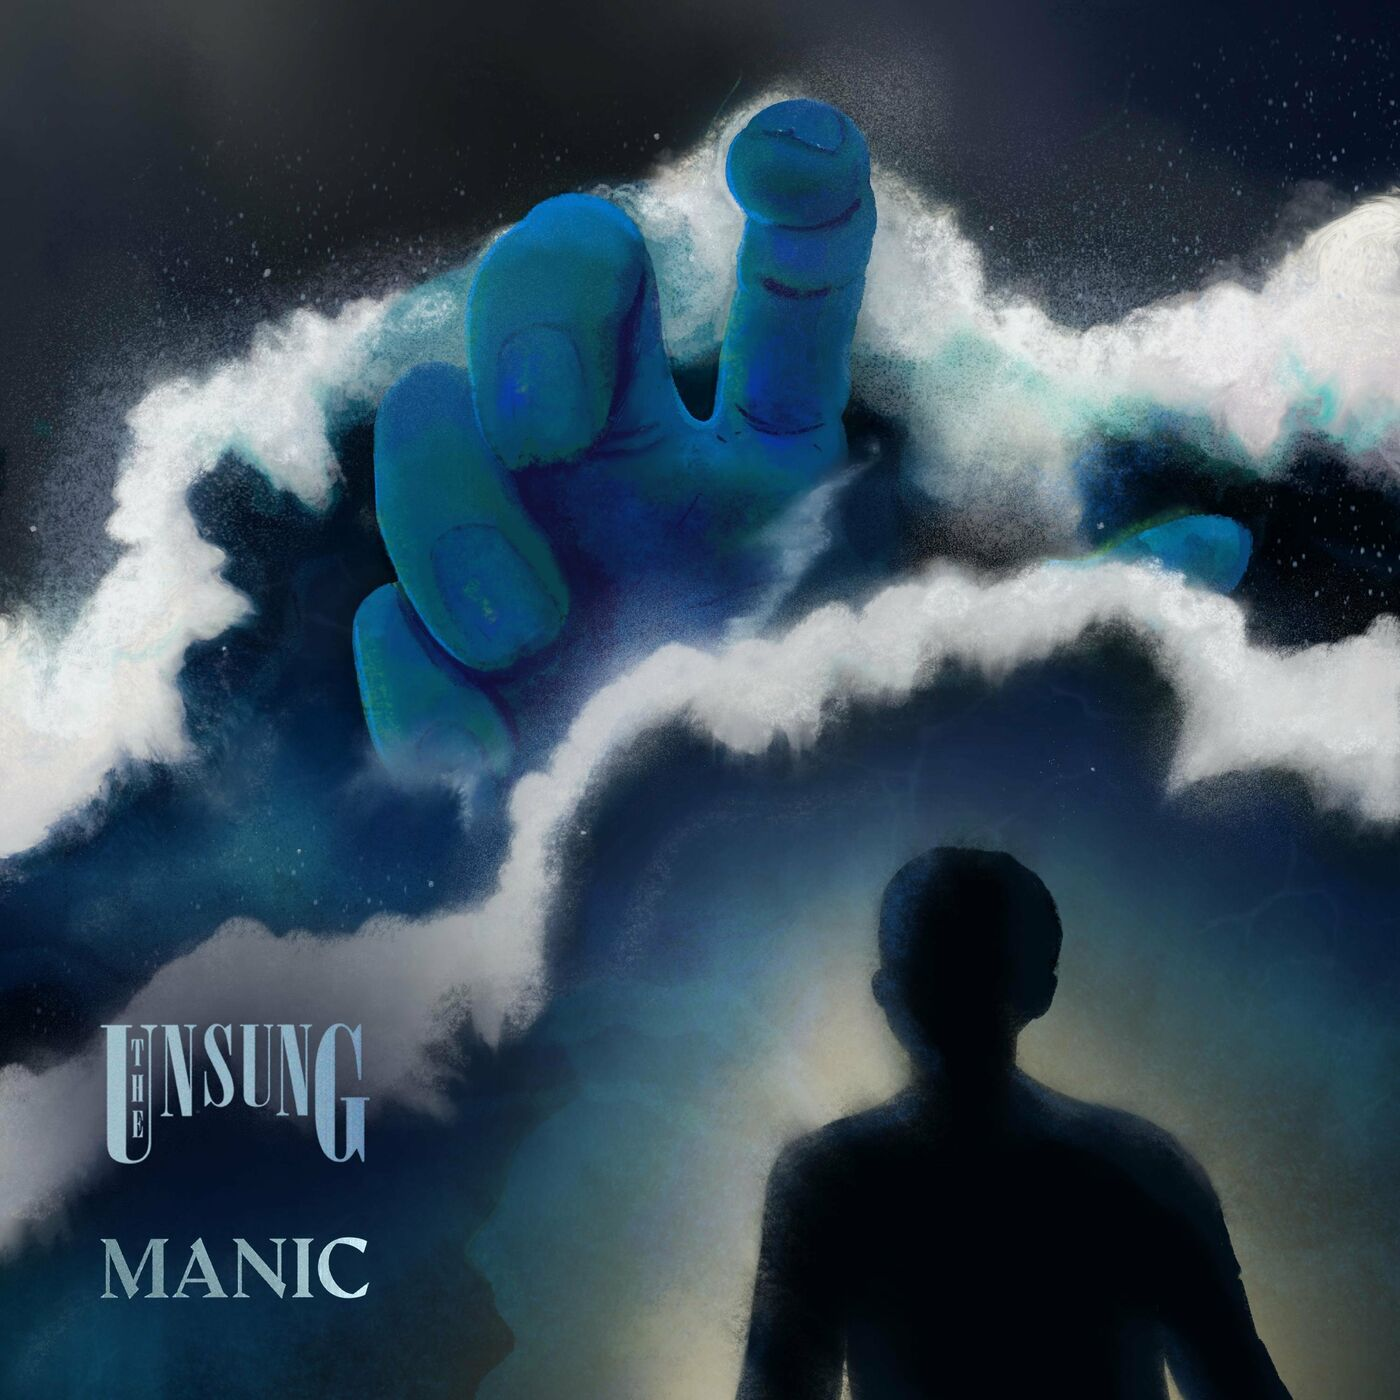 The Unsung - Manic [single] (2021)